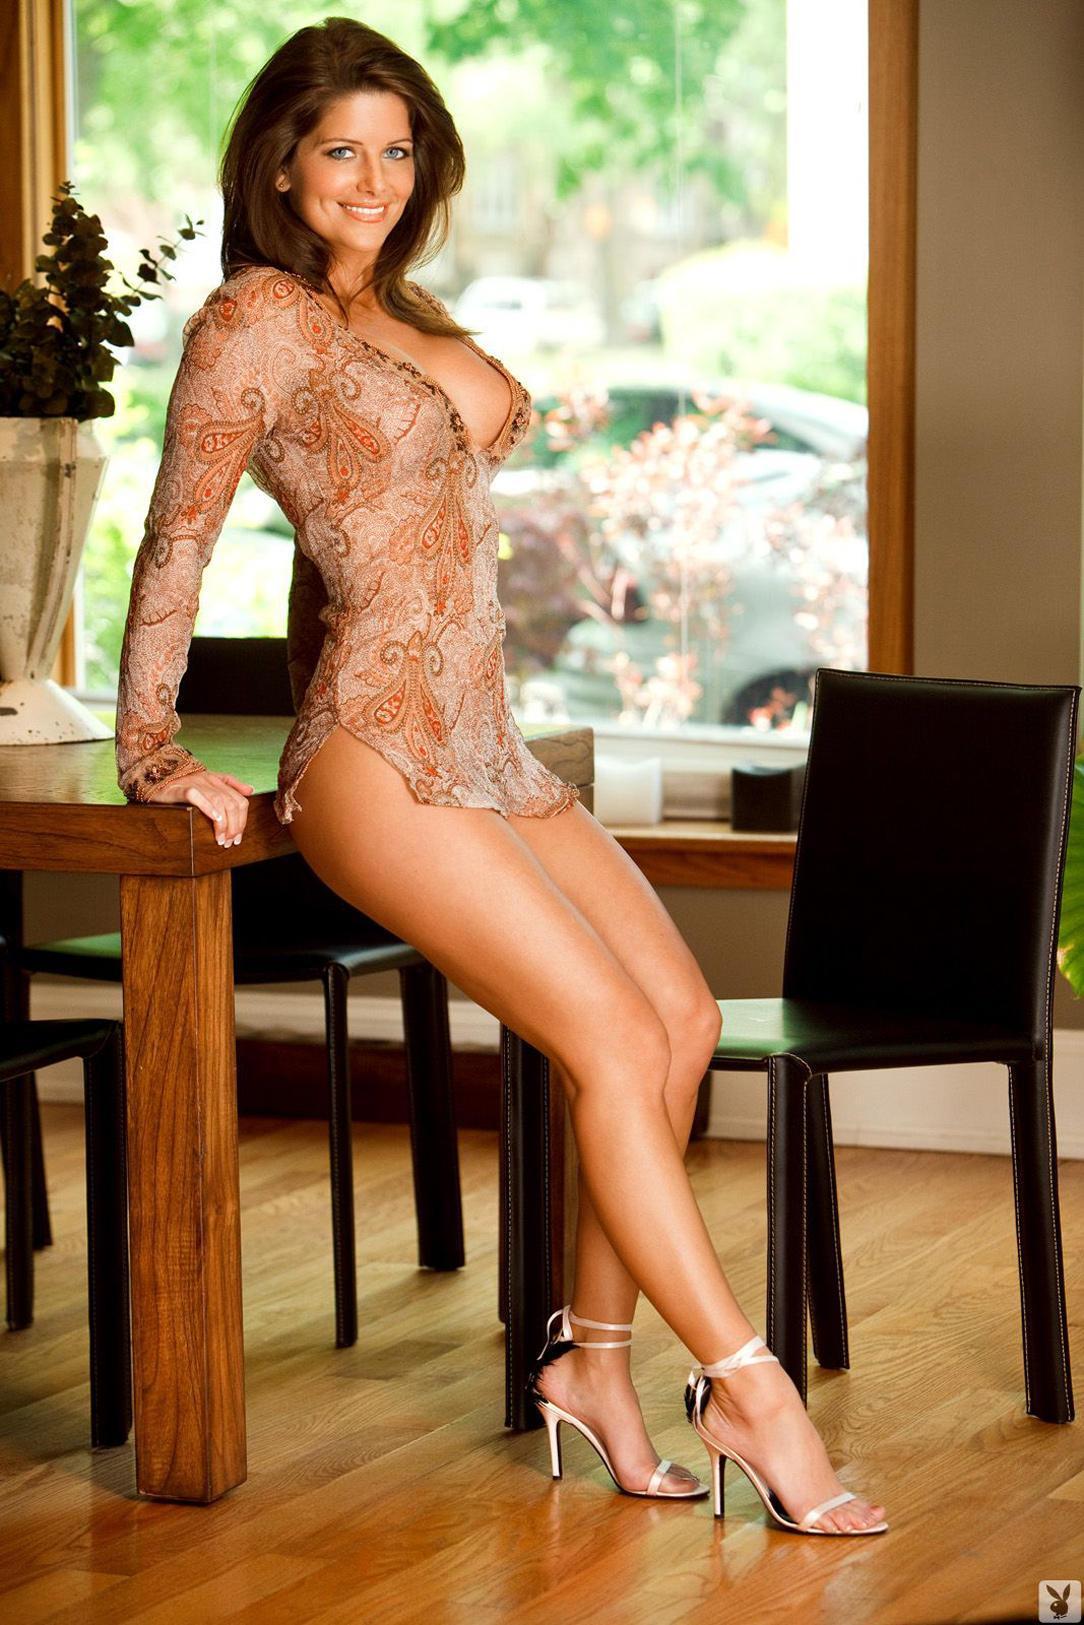 Babe milf sexy woman gallery — photo 7